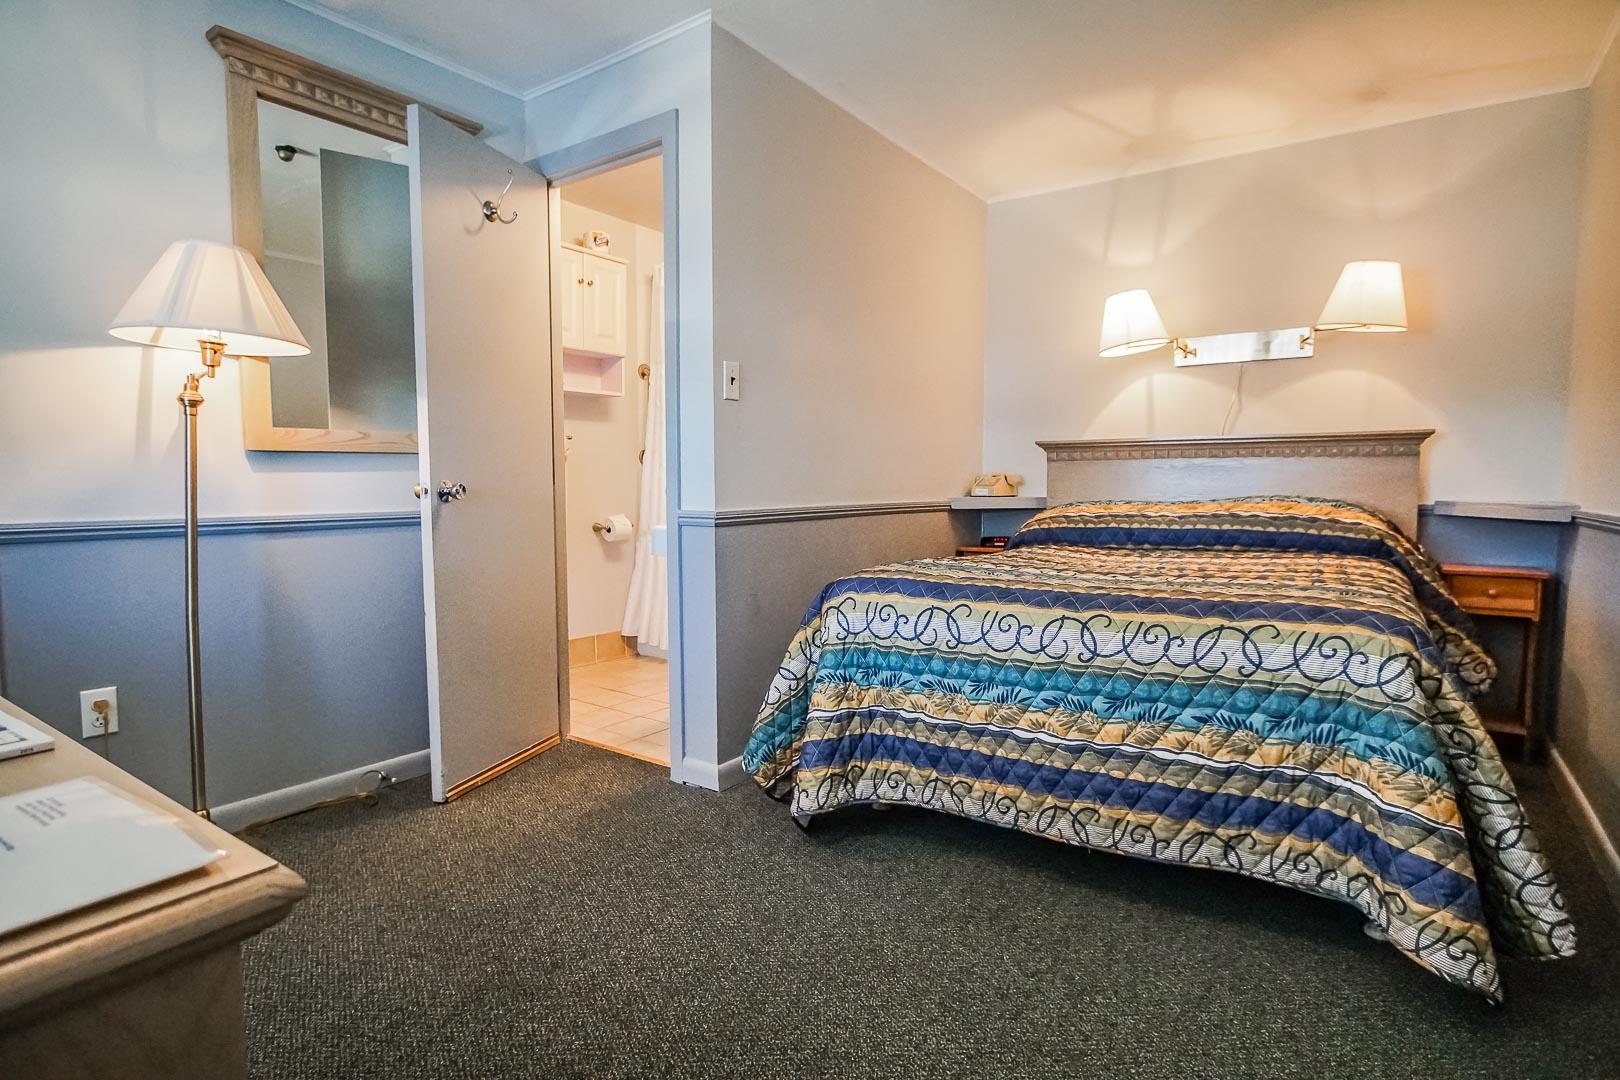 A cozy master bedroom at VRI's Harbor Landing Resort in Massachusetts.